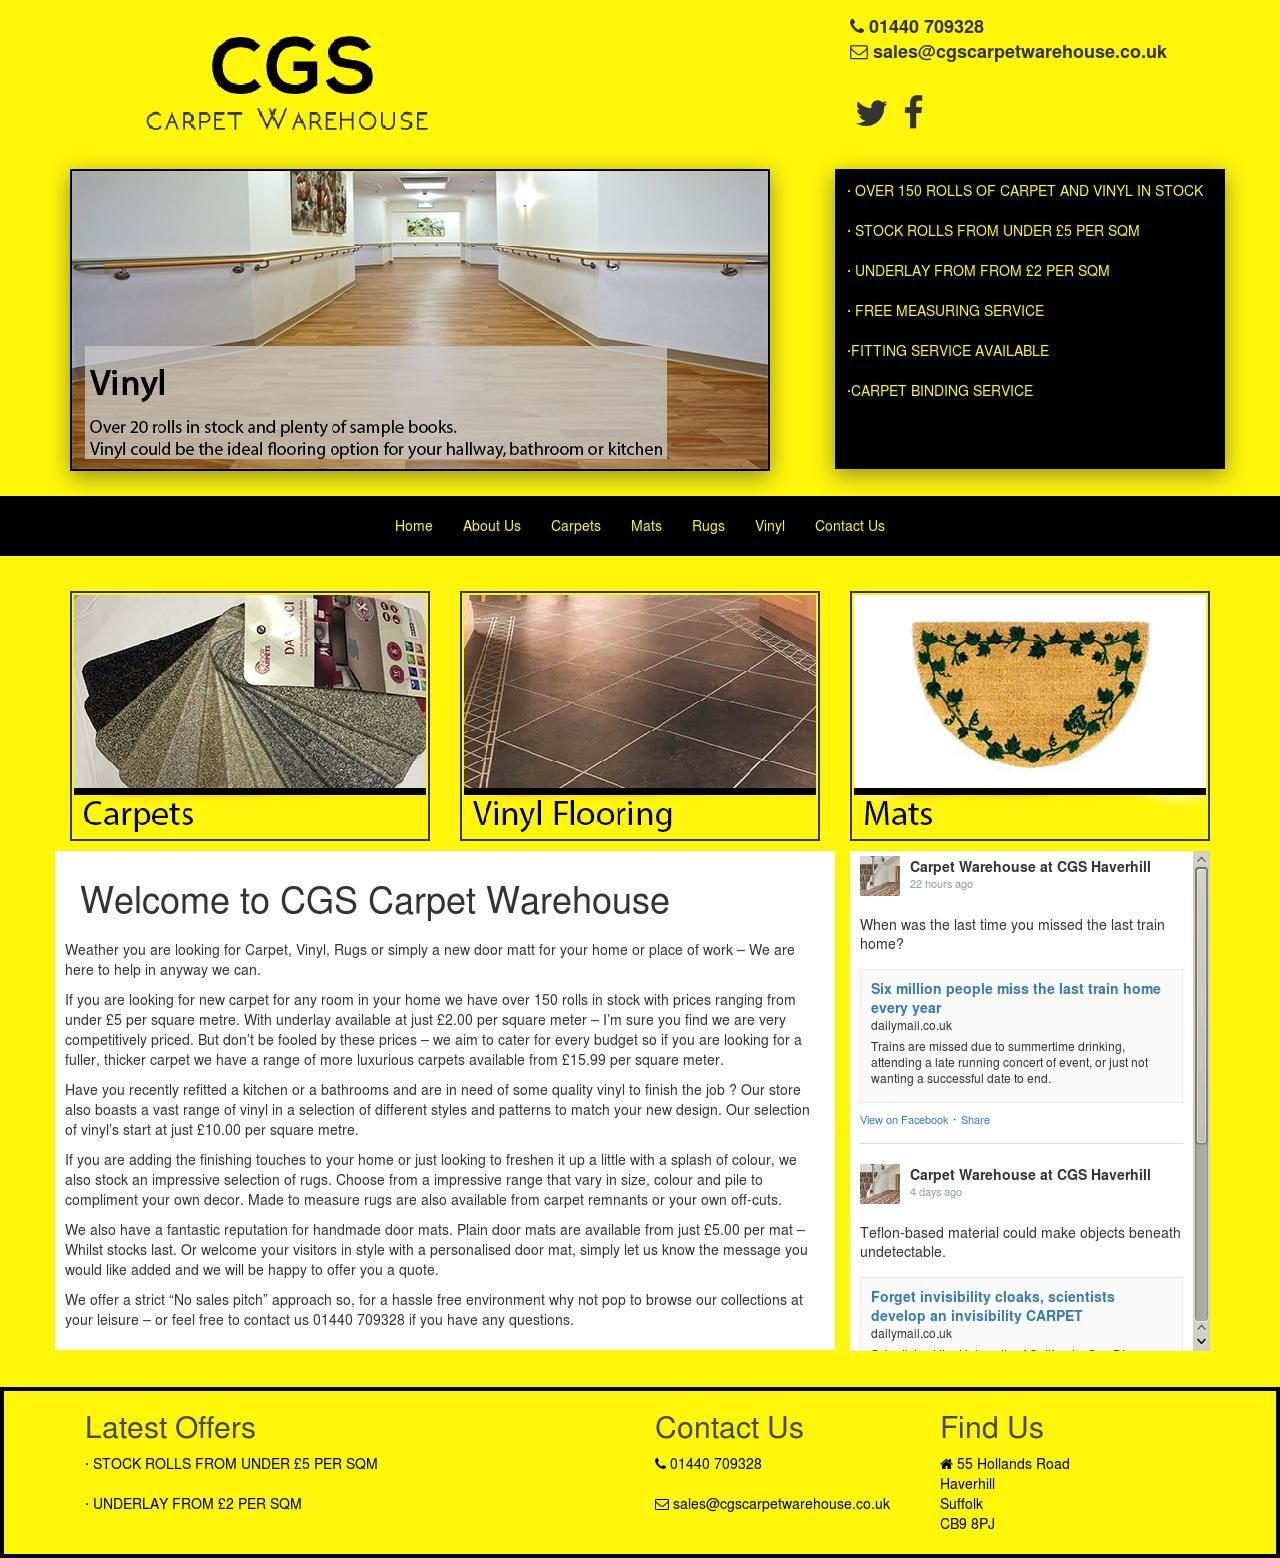 http://www.cgscarpetwarehouse.co.uk/